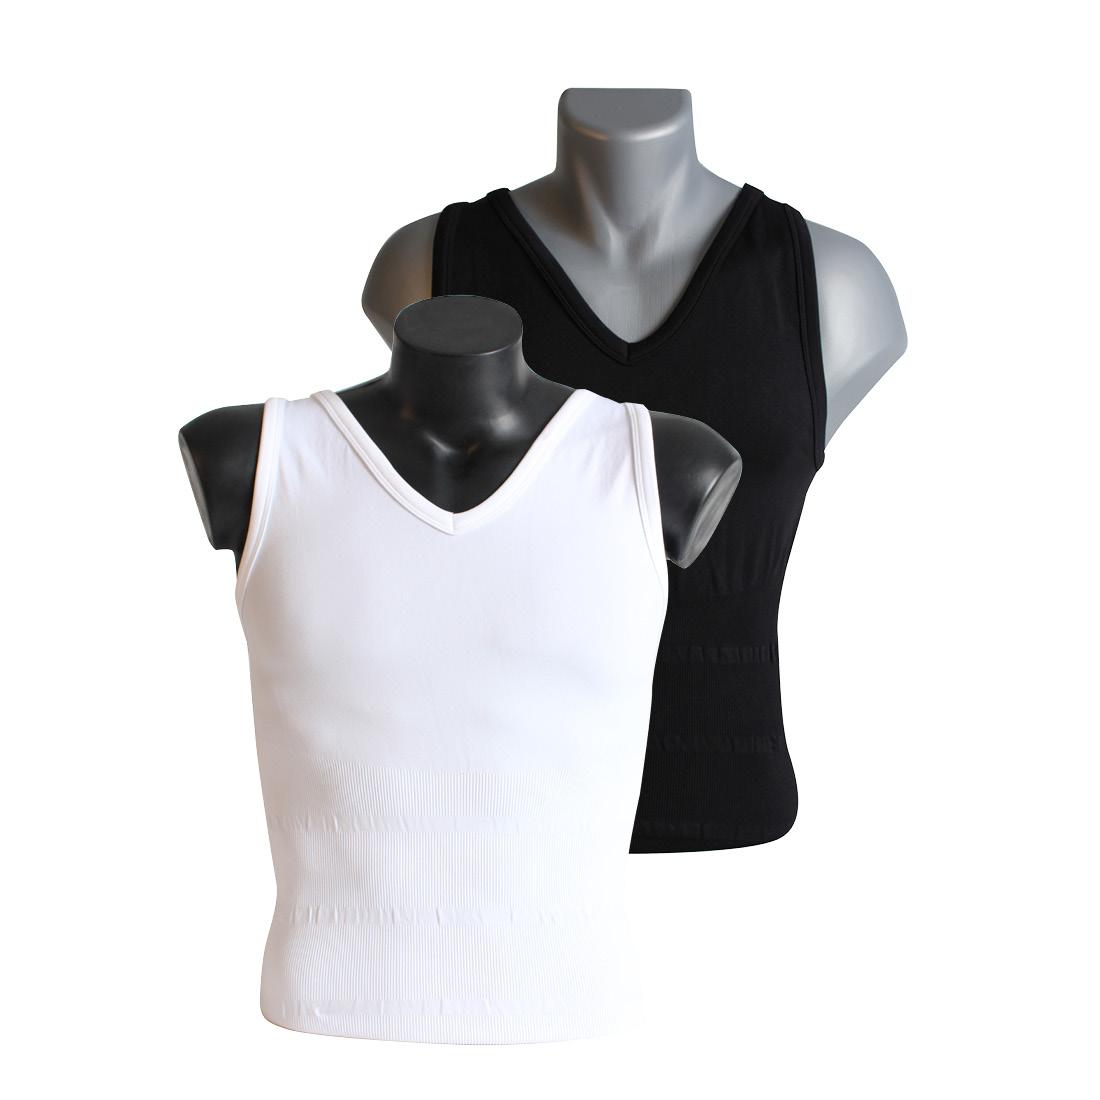 An image of Tone Tee White Vest XXL